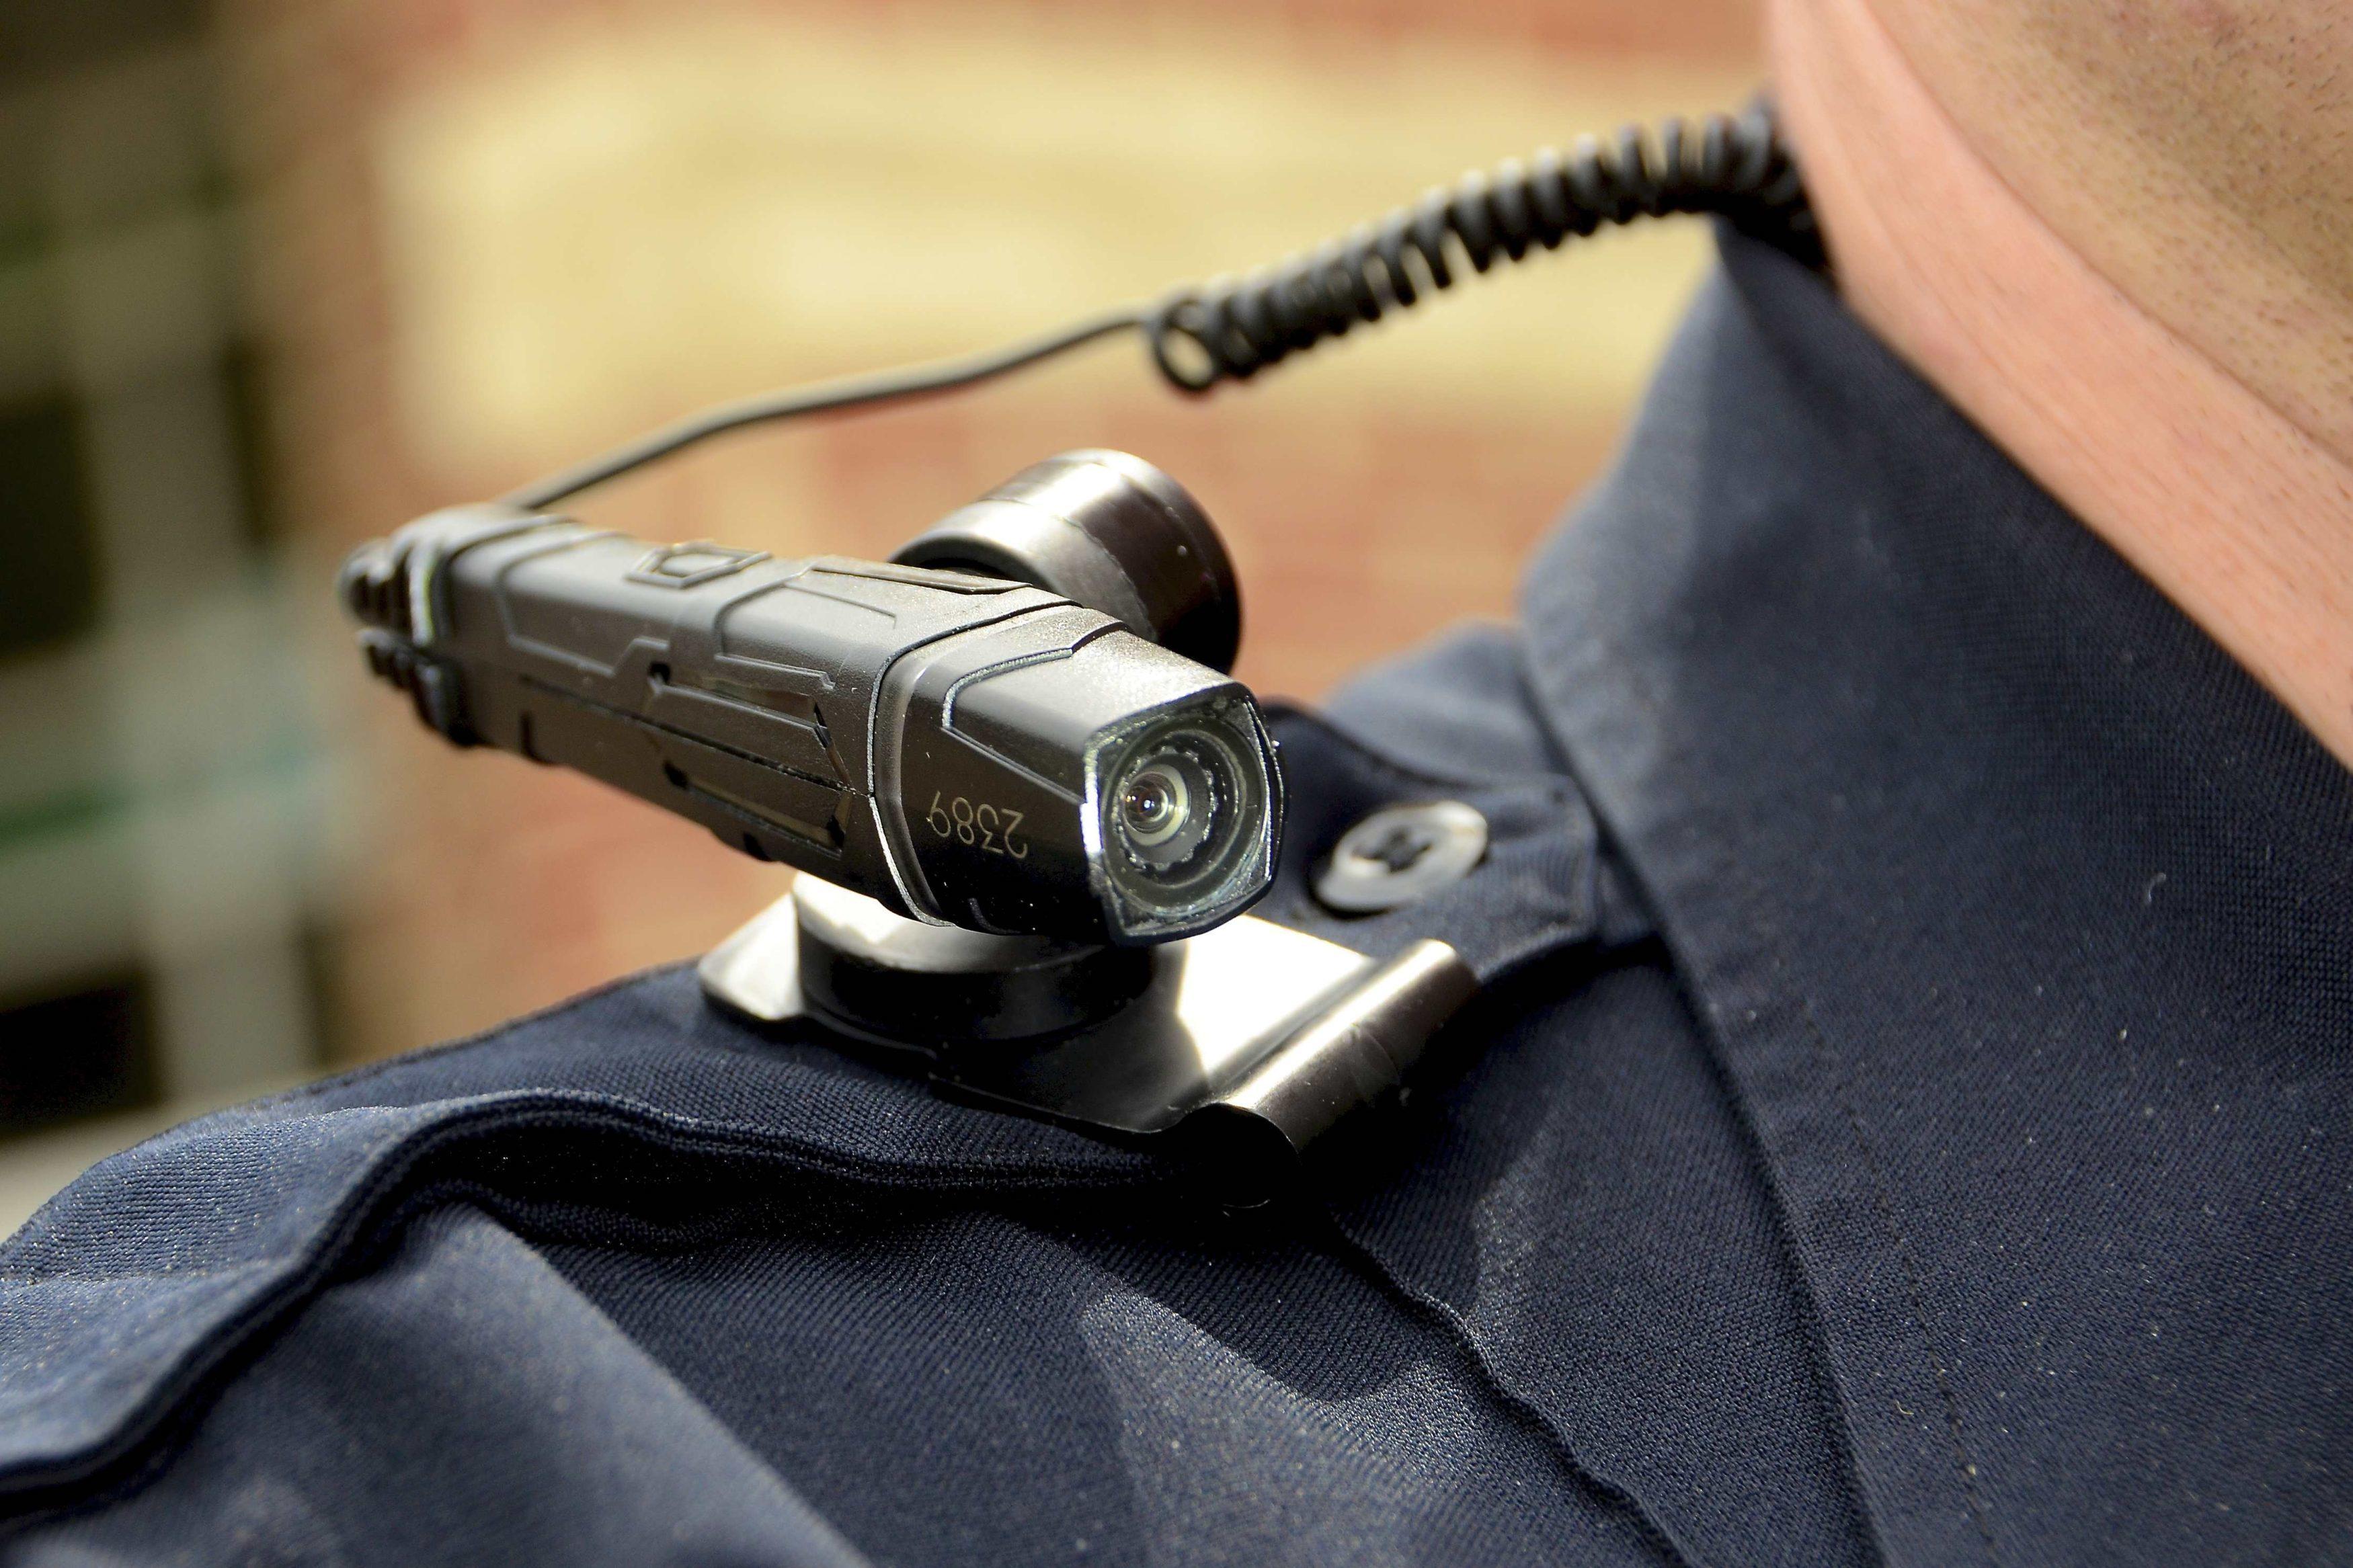 body-cameras-3500x2333-3500x2333.jpg